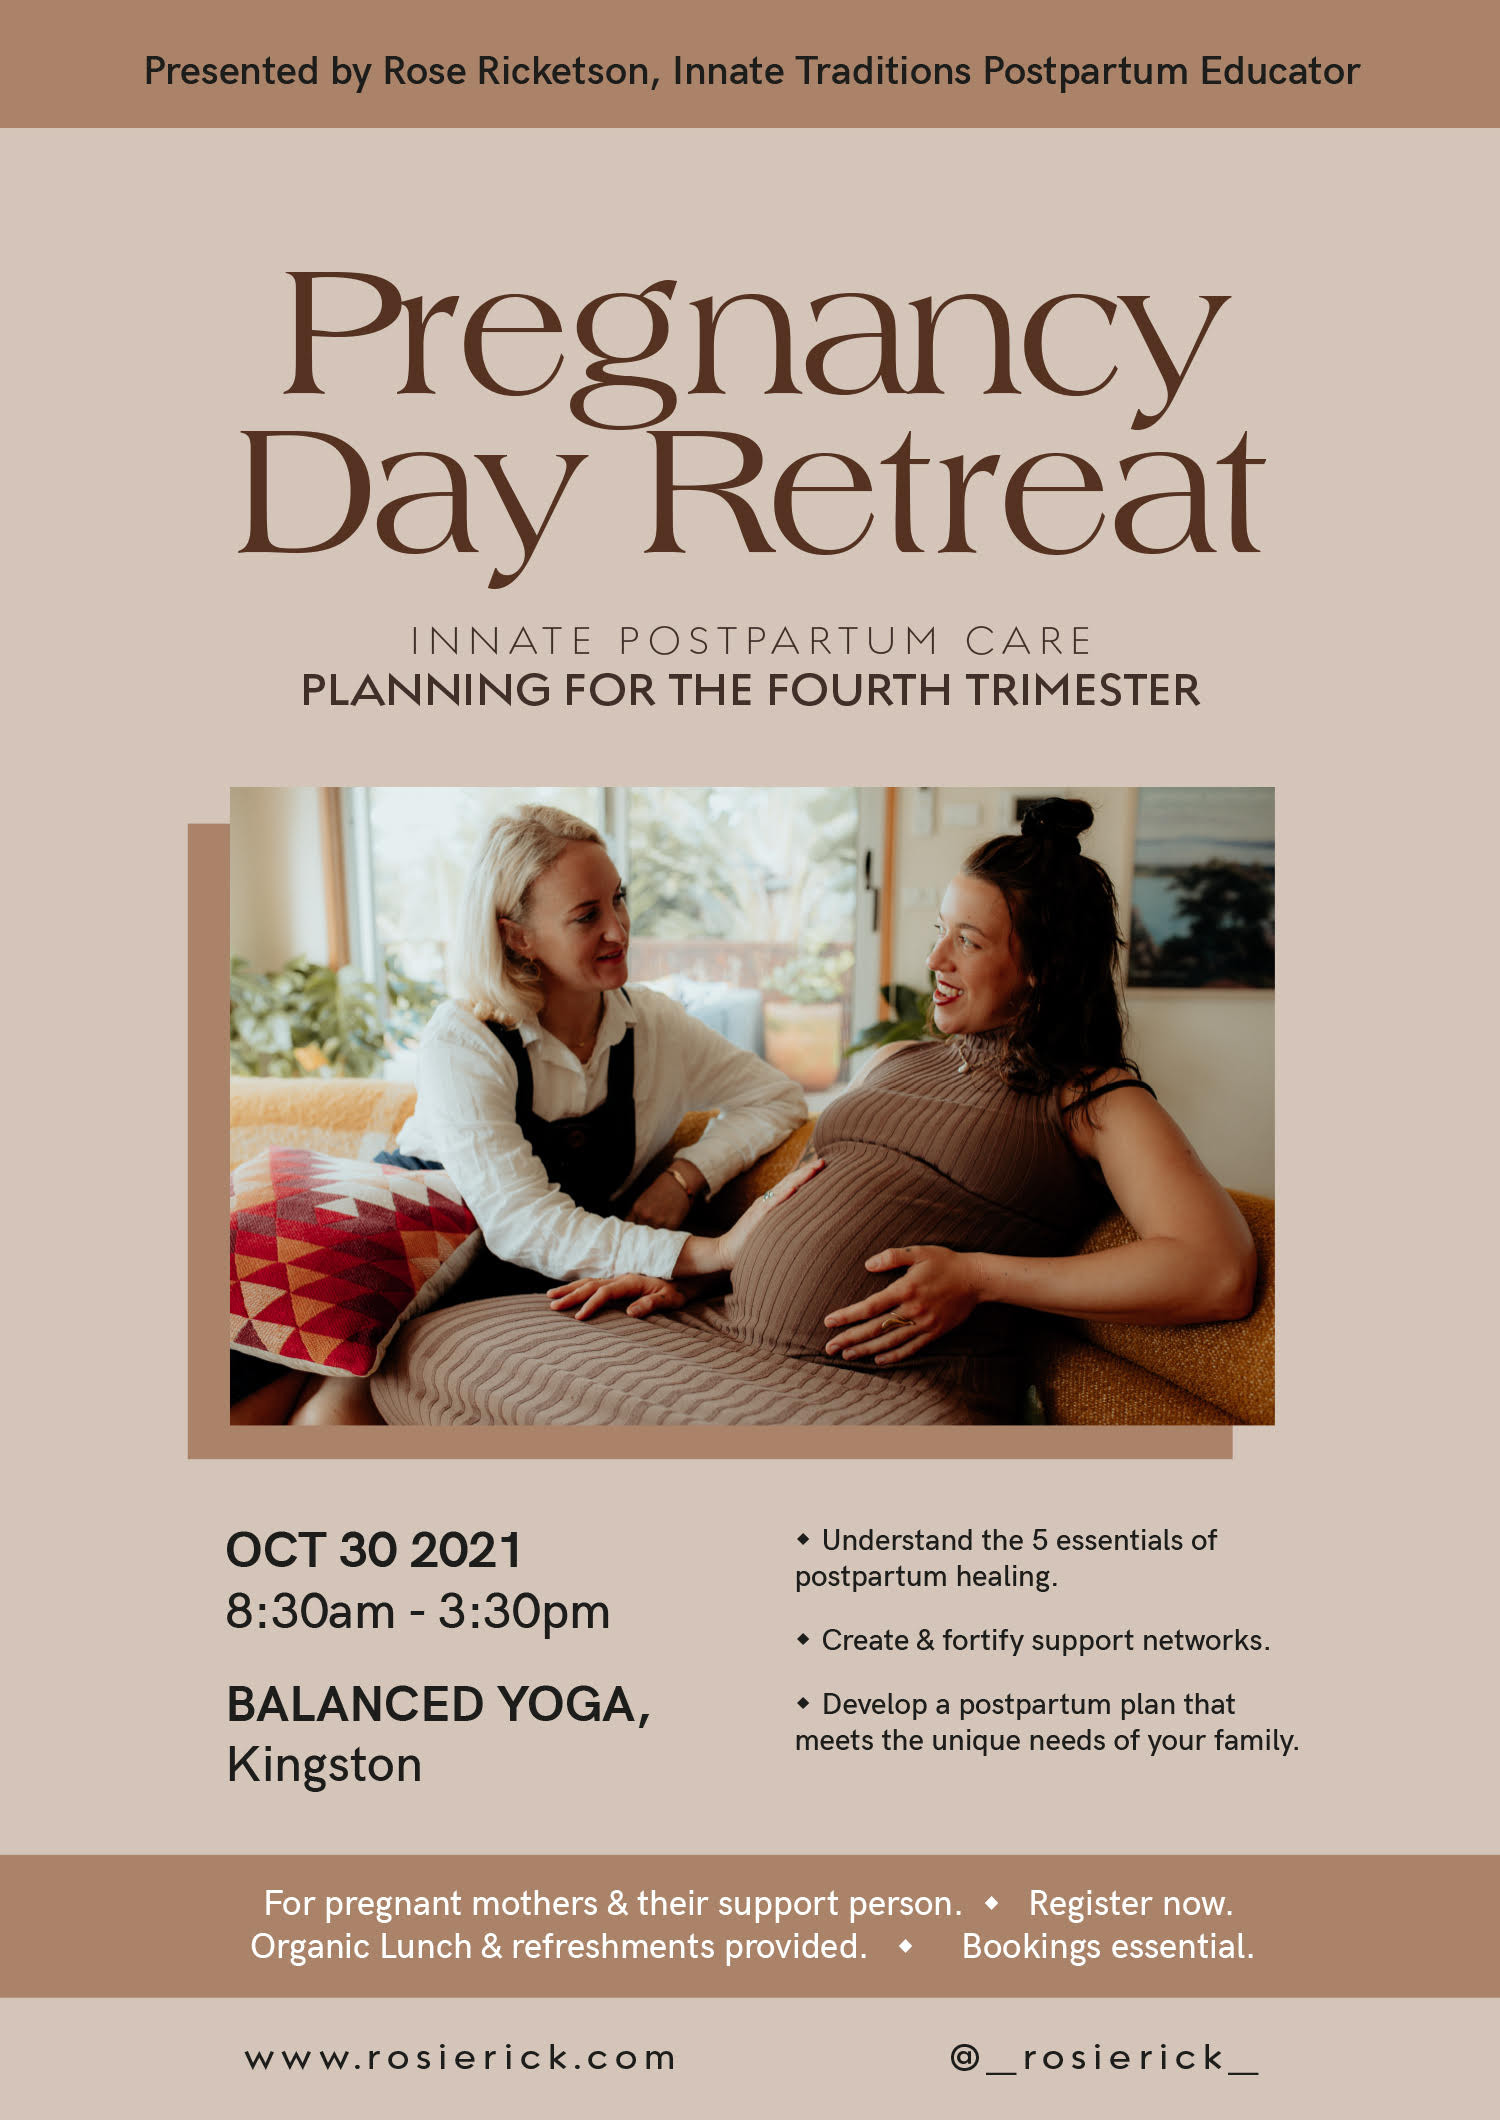 Pregnancy Day retreat